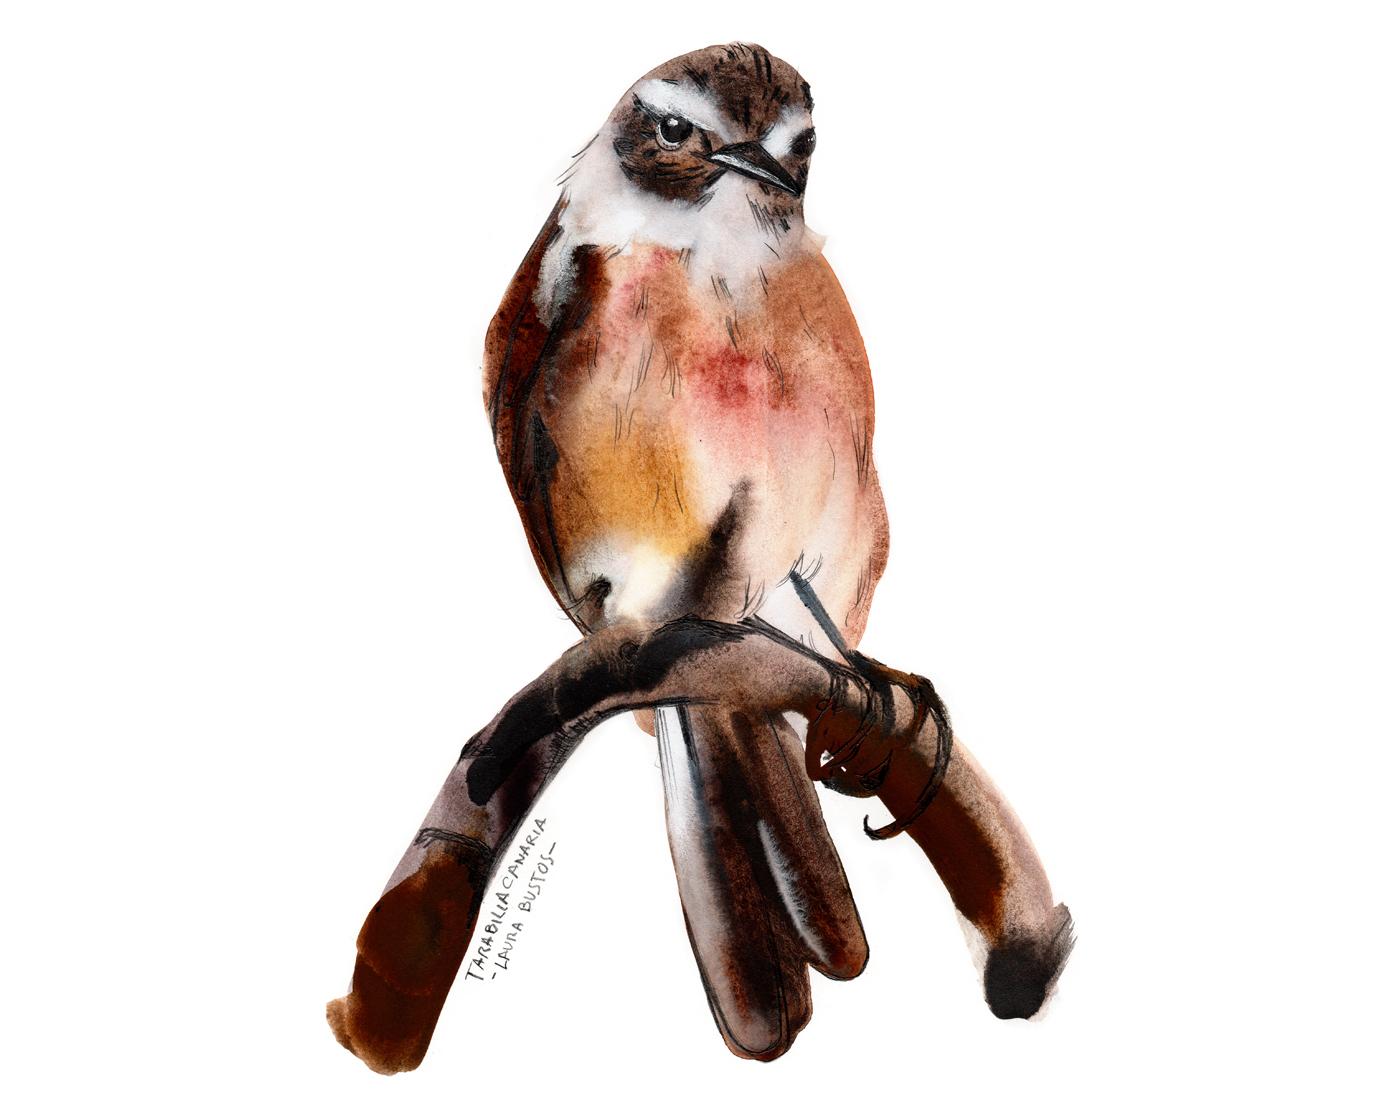 Proyecto personal pájaros Tarabilla canaria realizado en grafito acuarelable